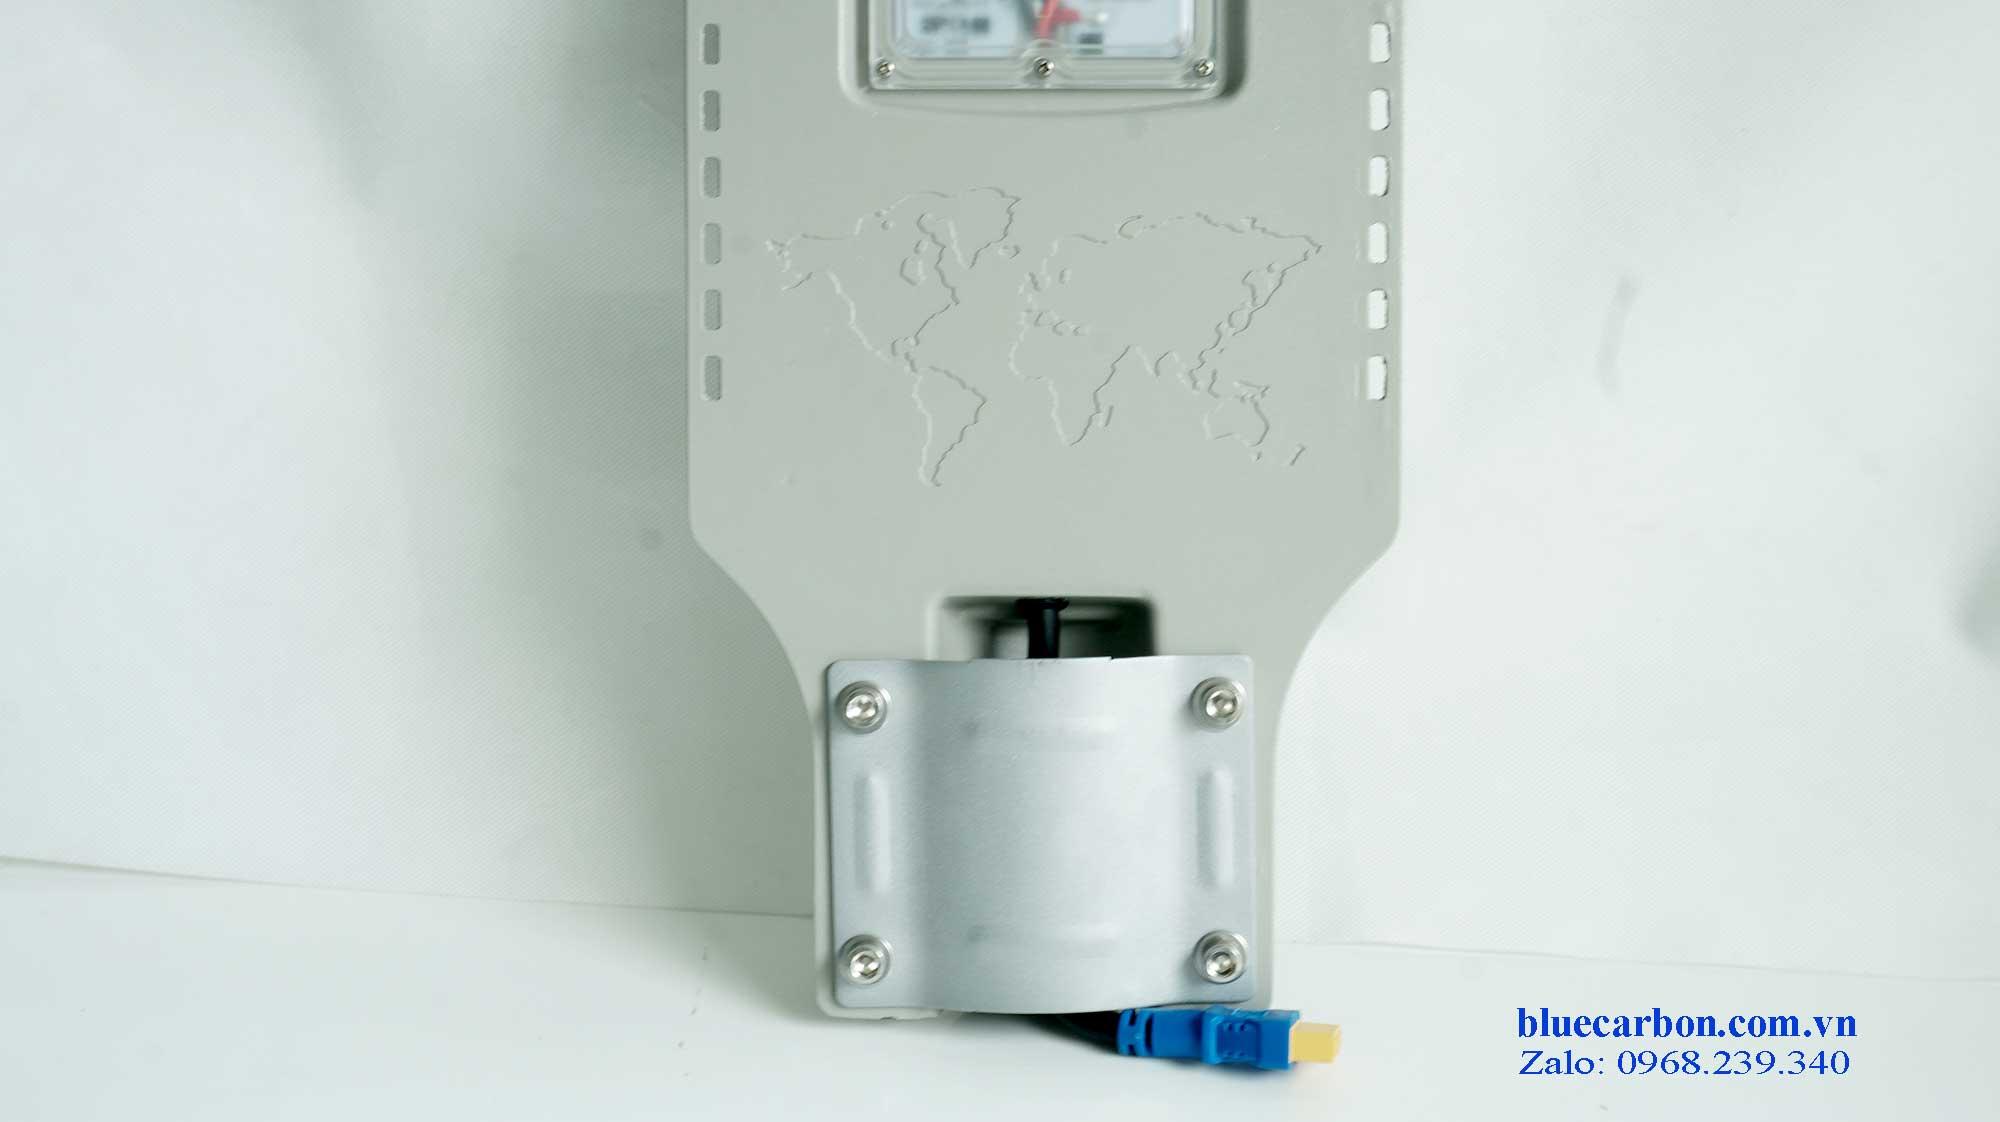 Đèn Blue Carbon BCT-OTL 150W